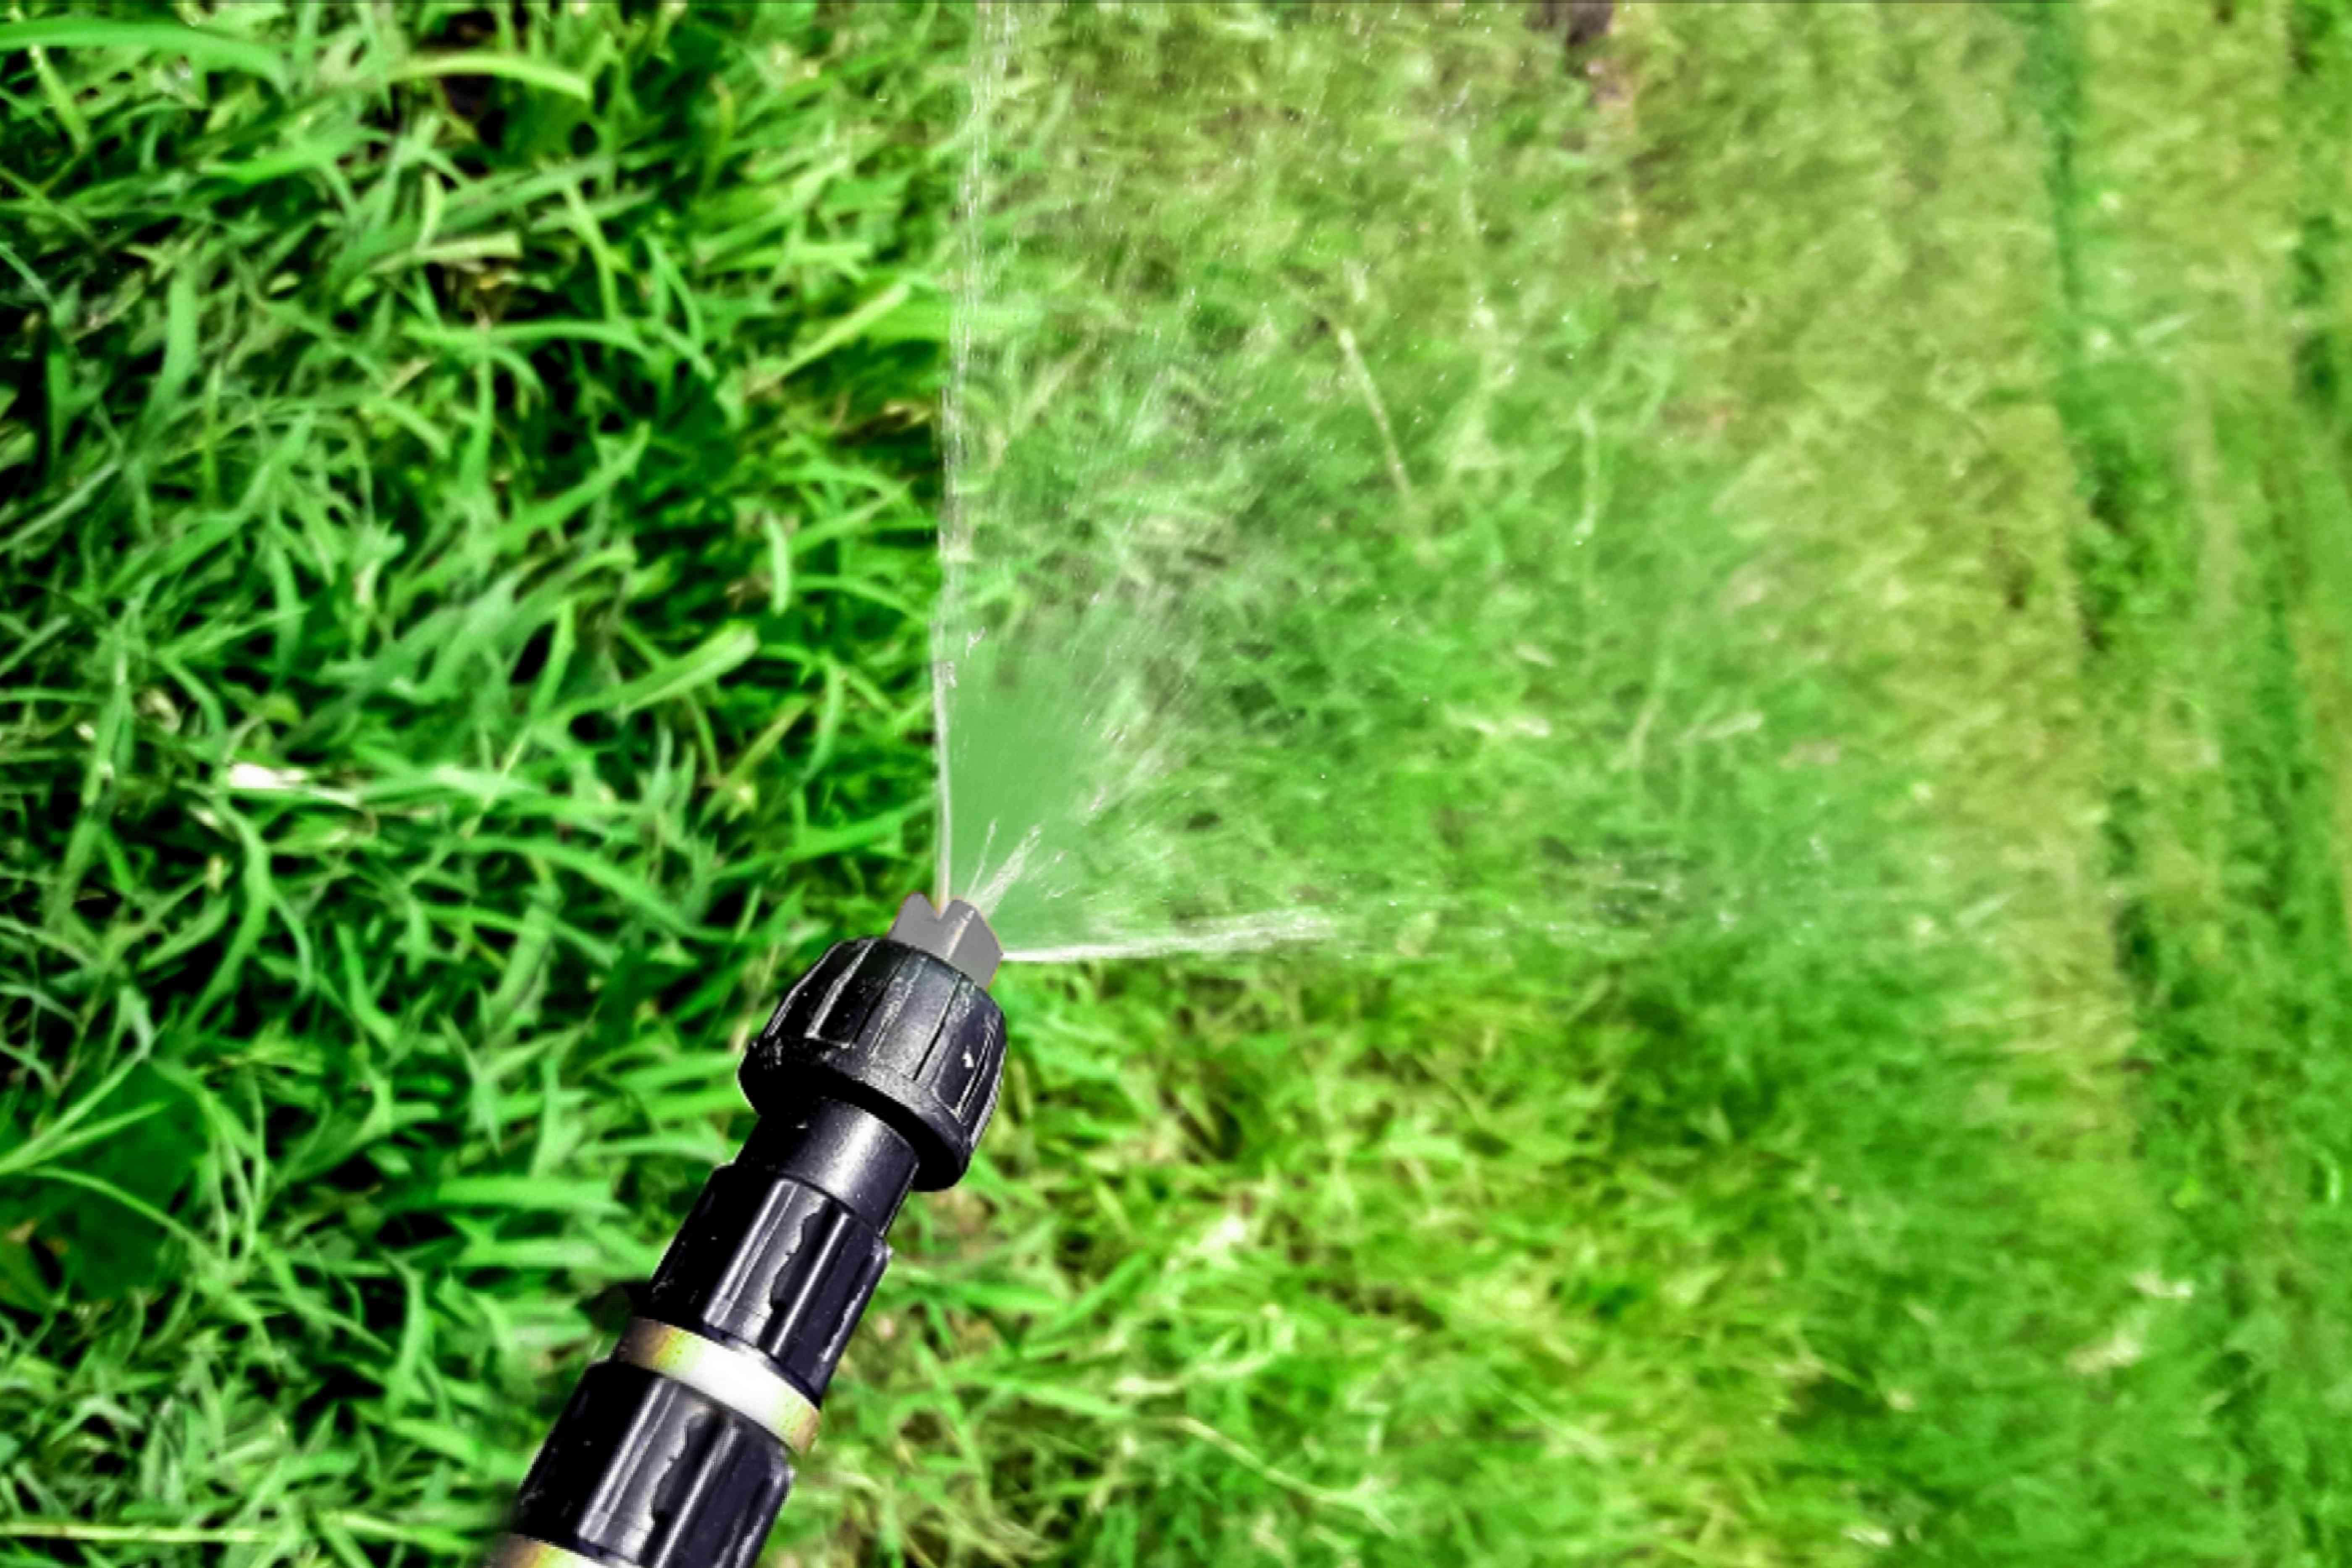 applying fungicide